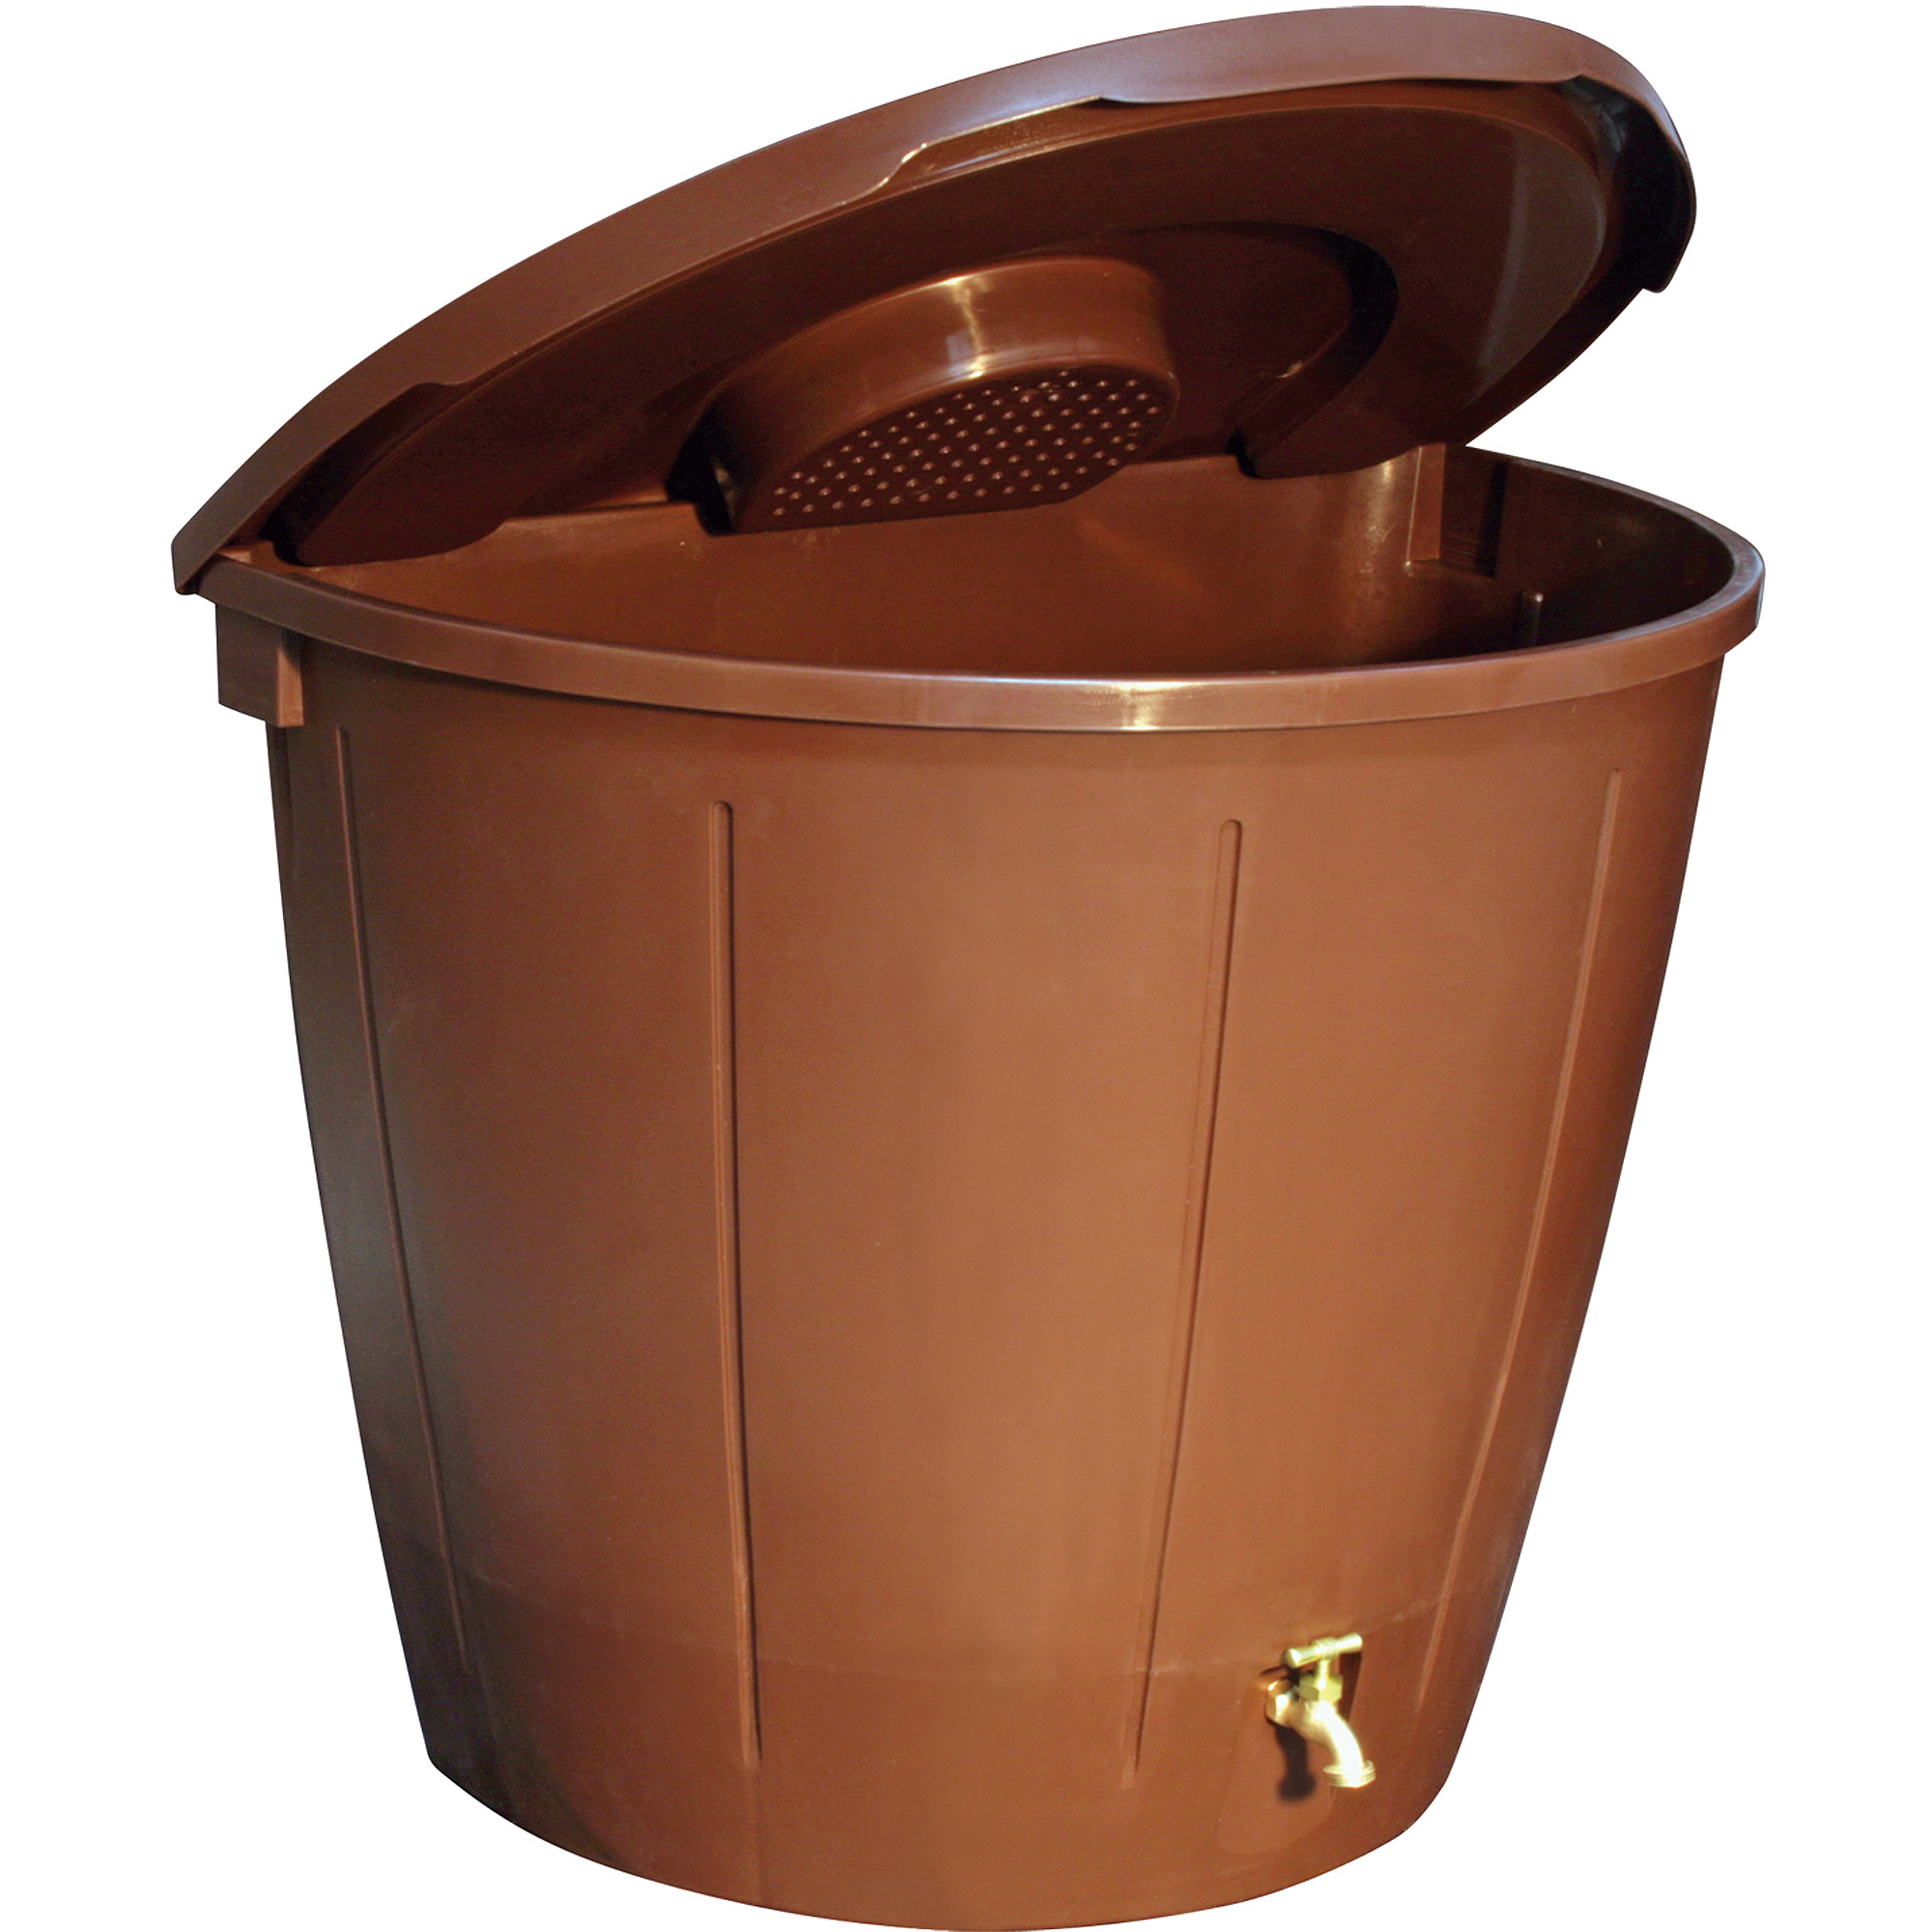 Koolscape 50 gal Space-Saver Rain Barrel with 5 Pots